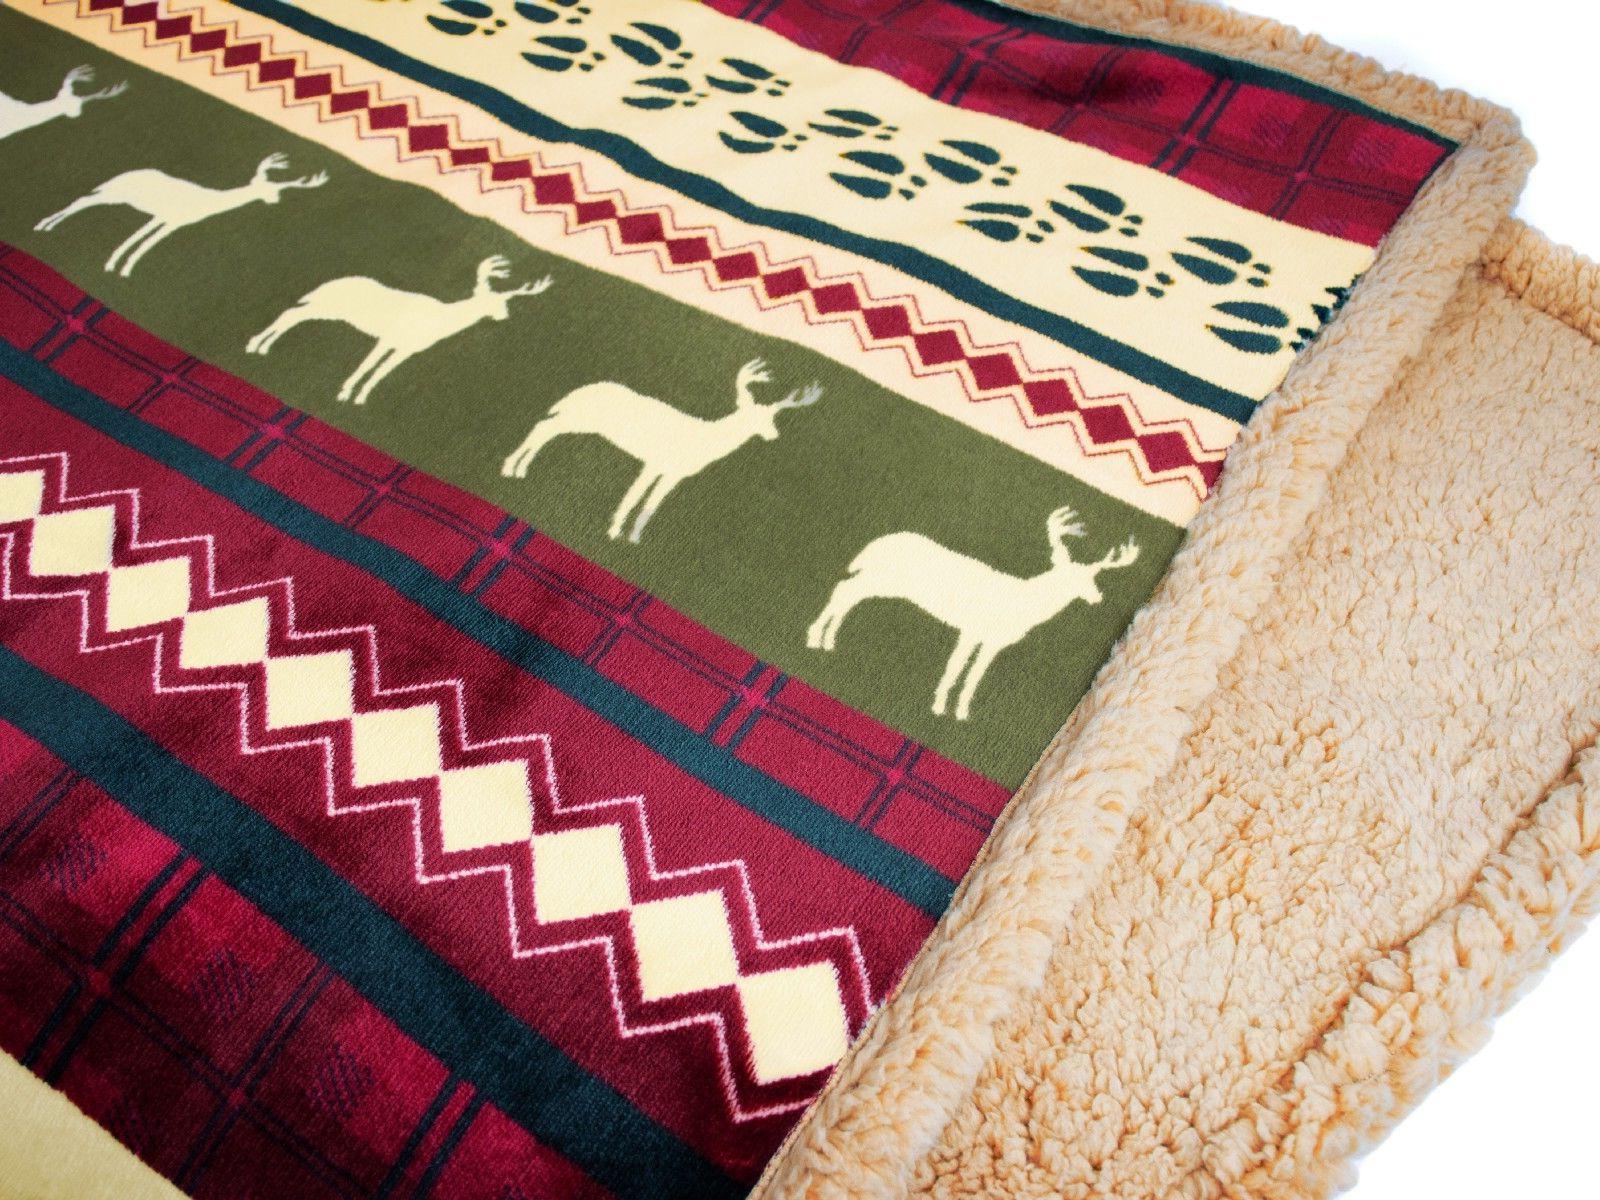 Soft Winter Blanket Striped Checkered